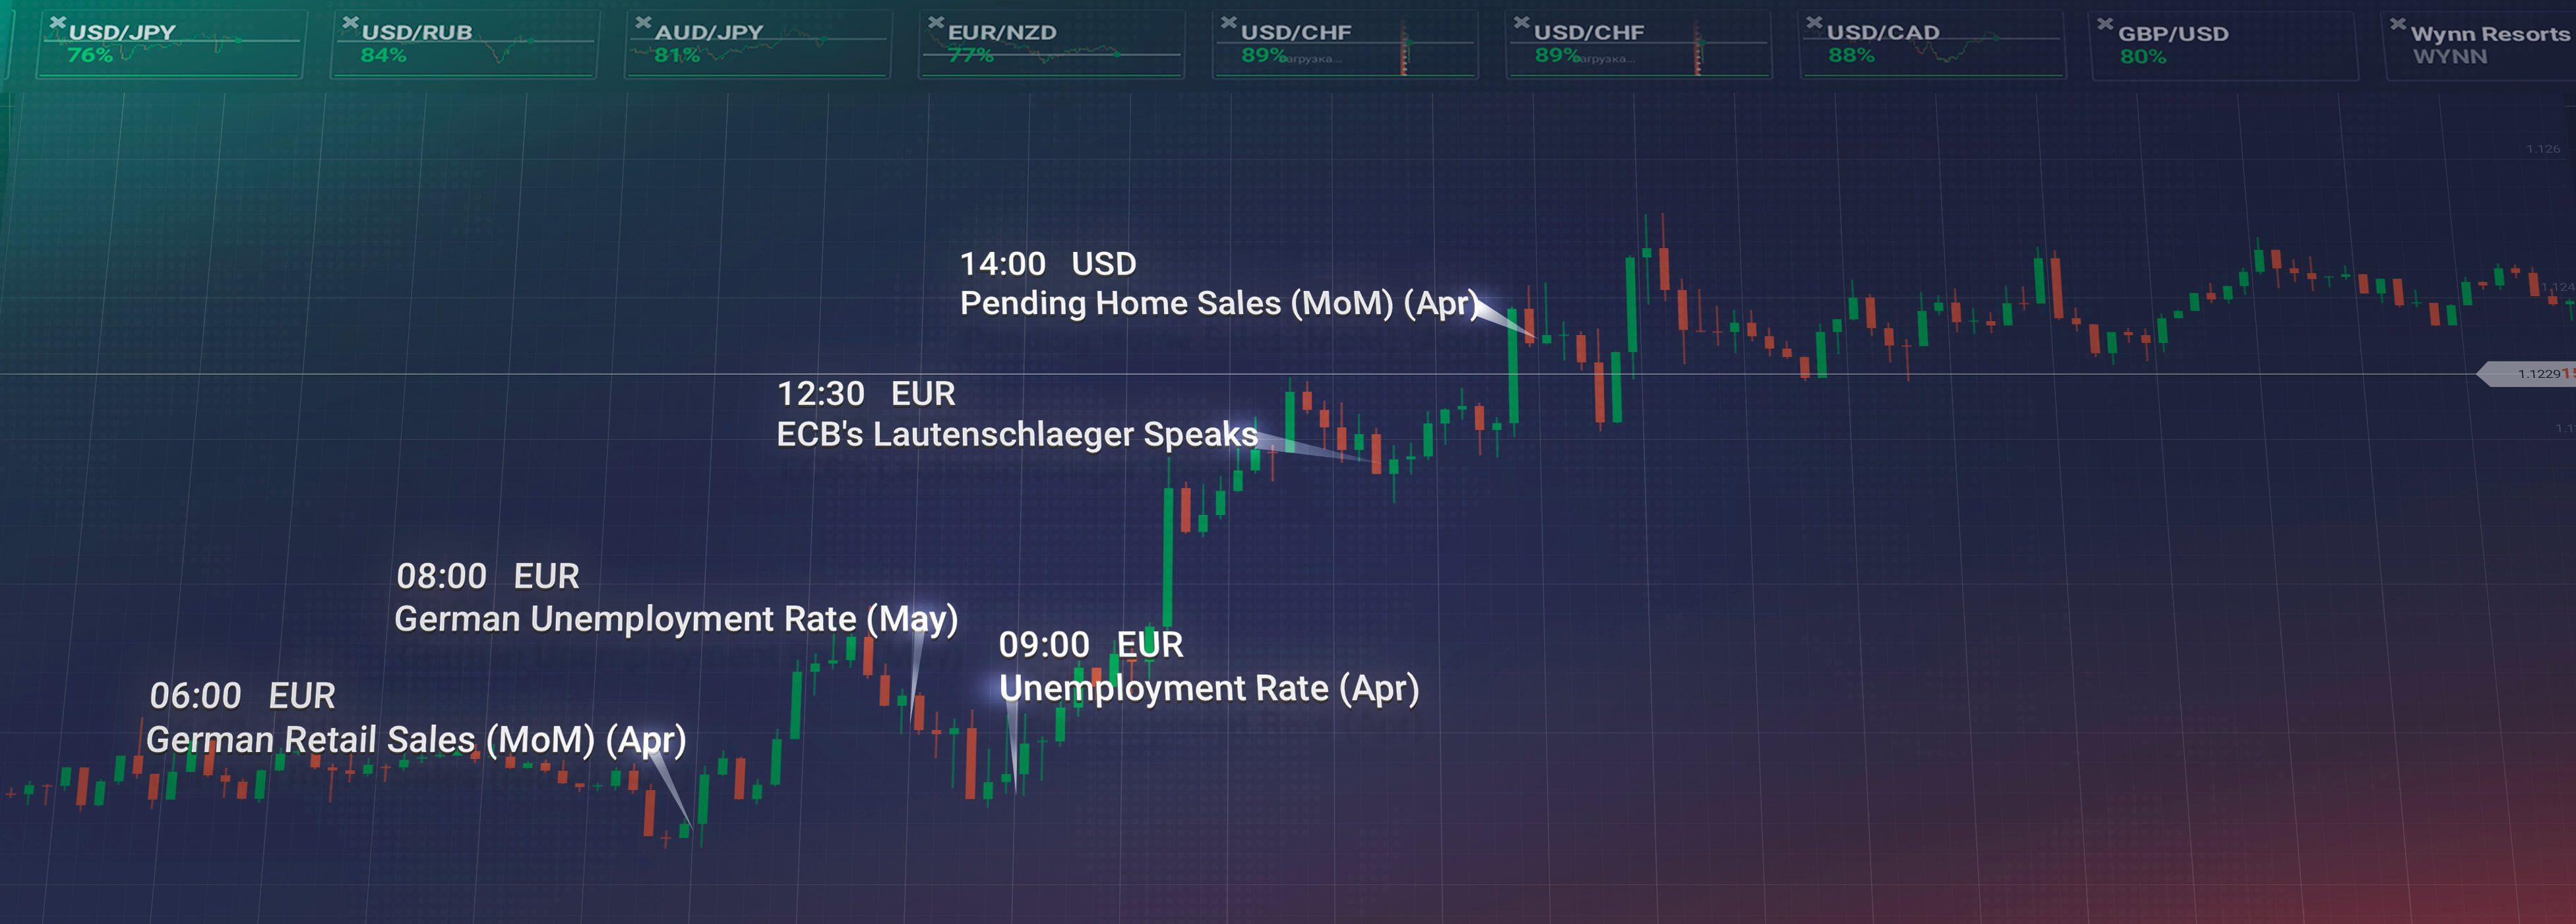 Forex earnings calendar